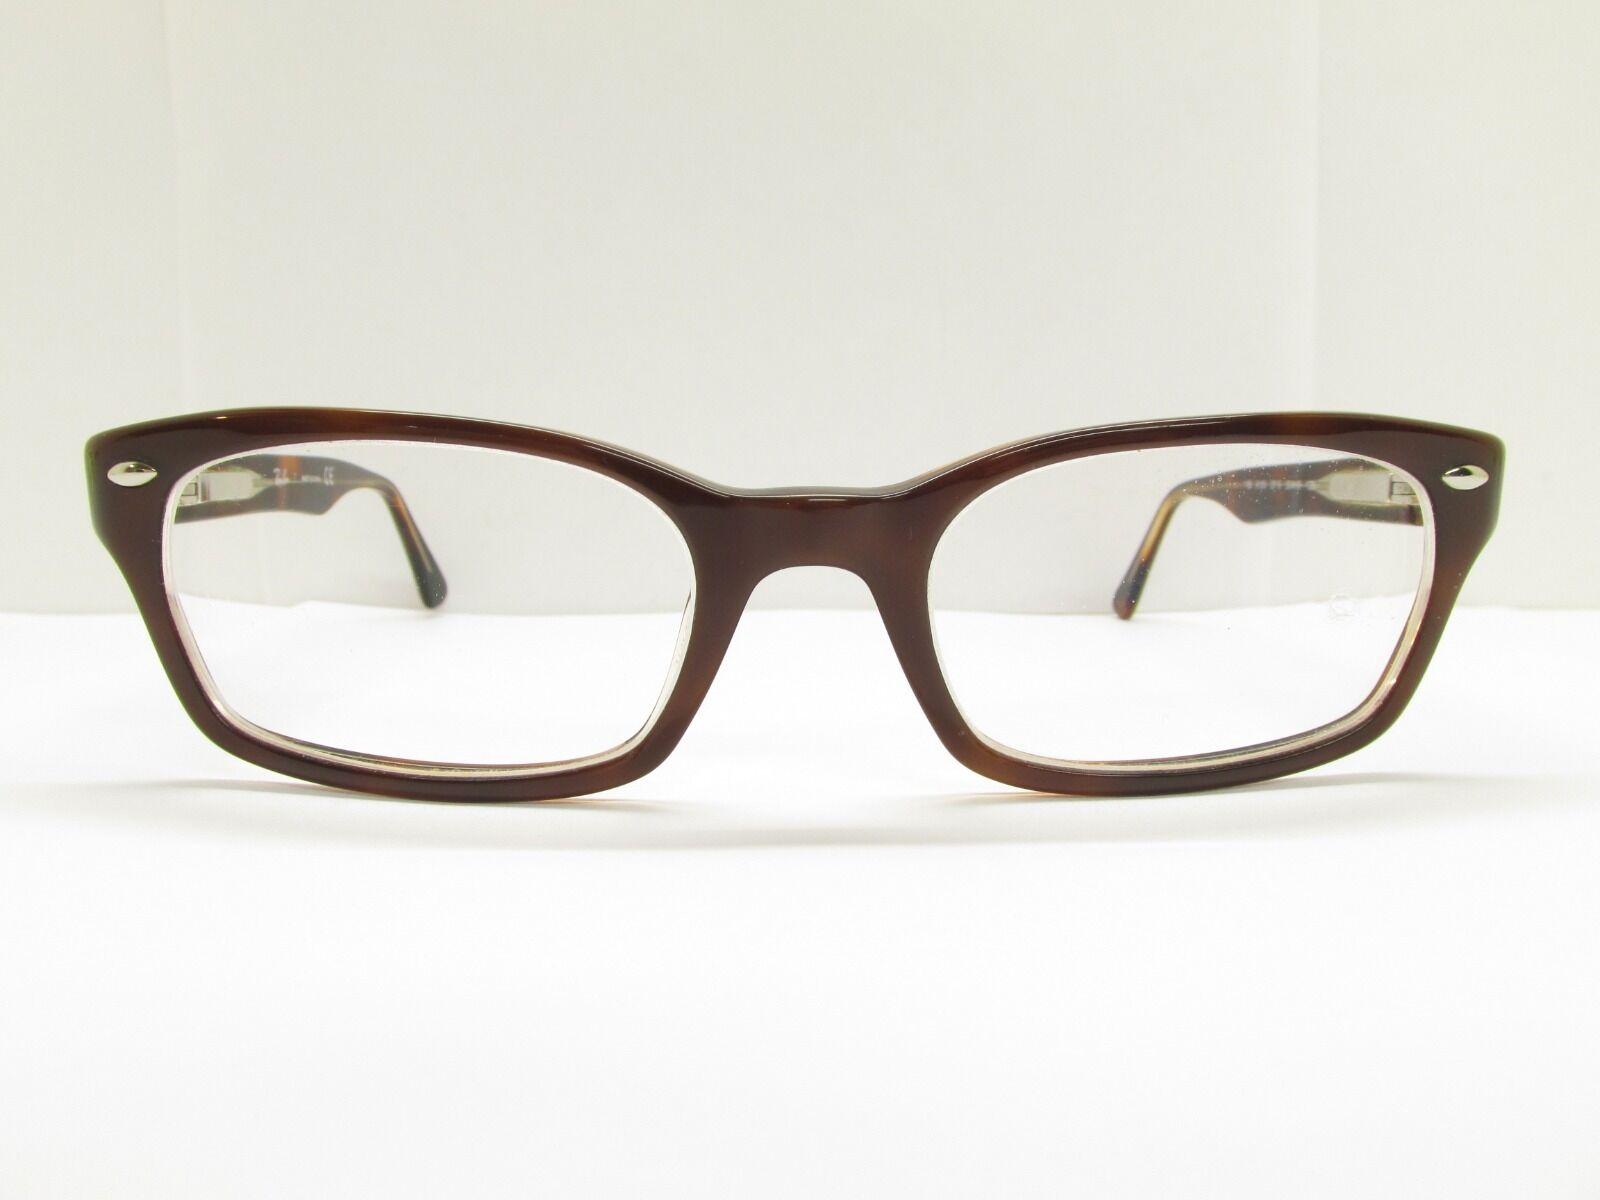 Ray-Ban Rb5150 2049 Eyeglasses Eyewear Frames 52-19-135 Tv3 80471a ...